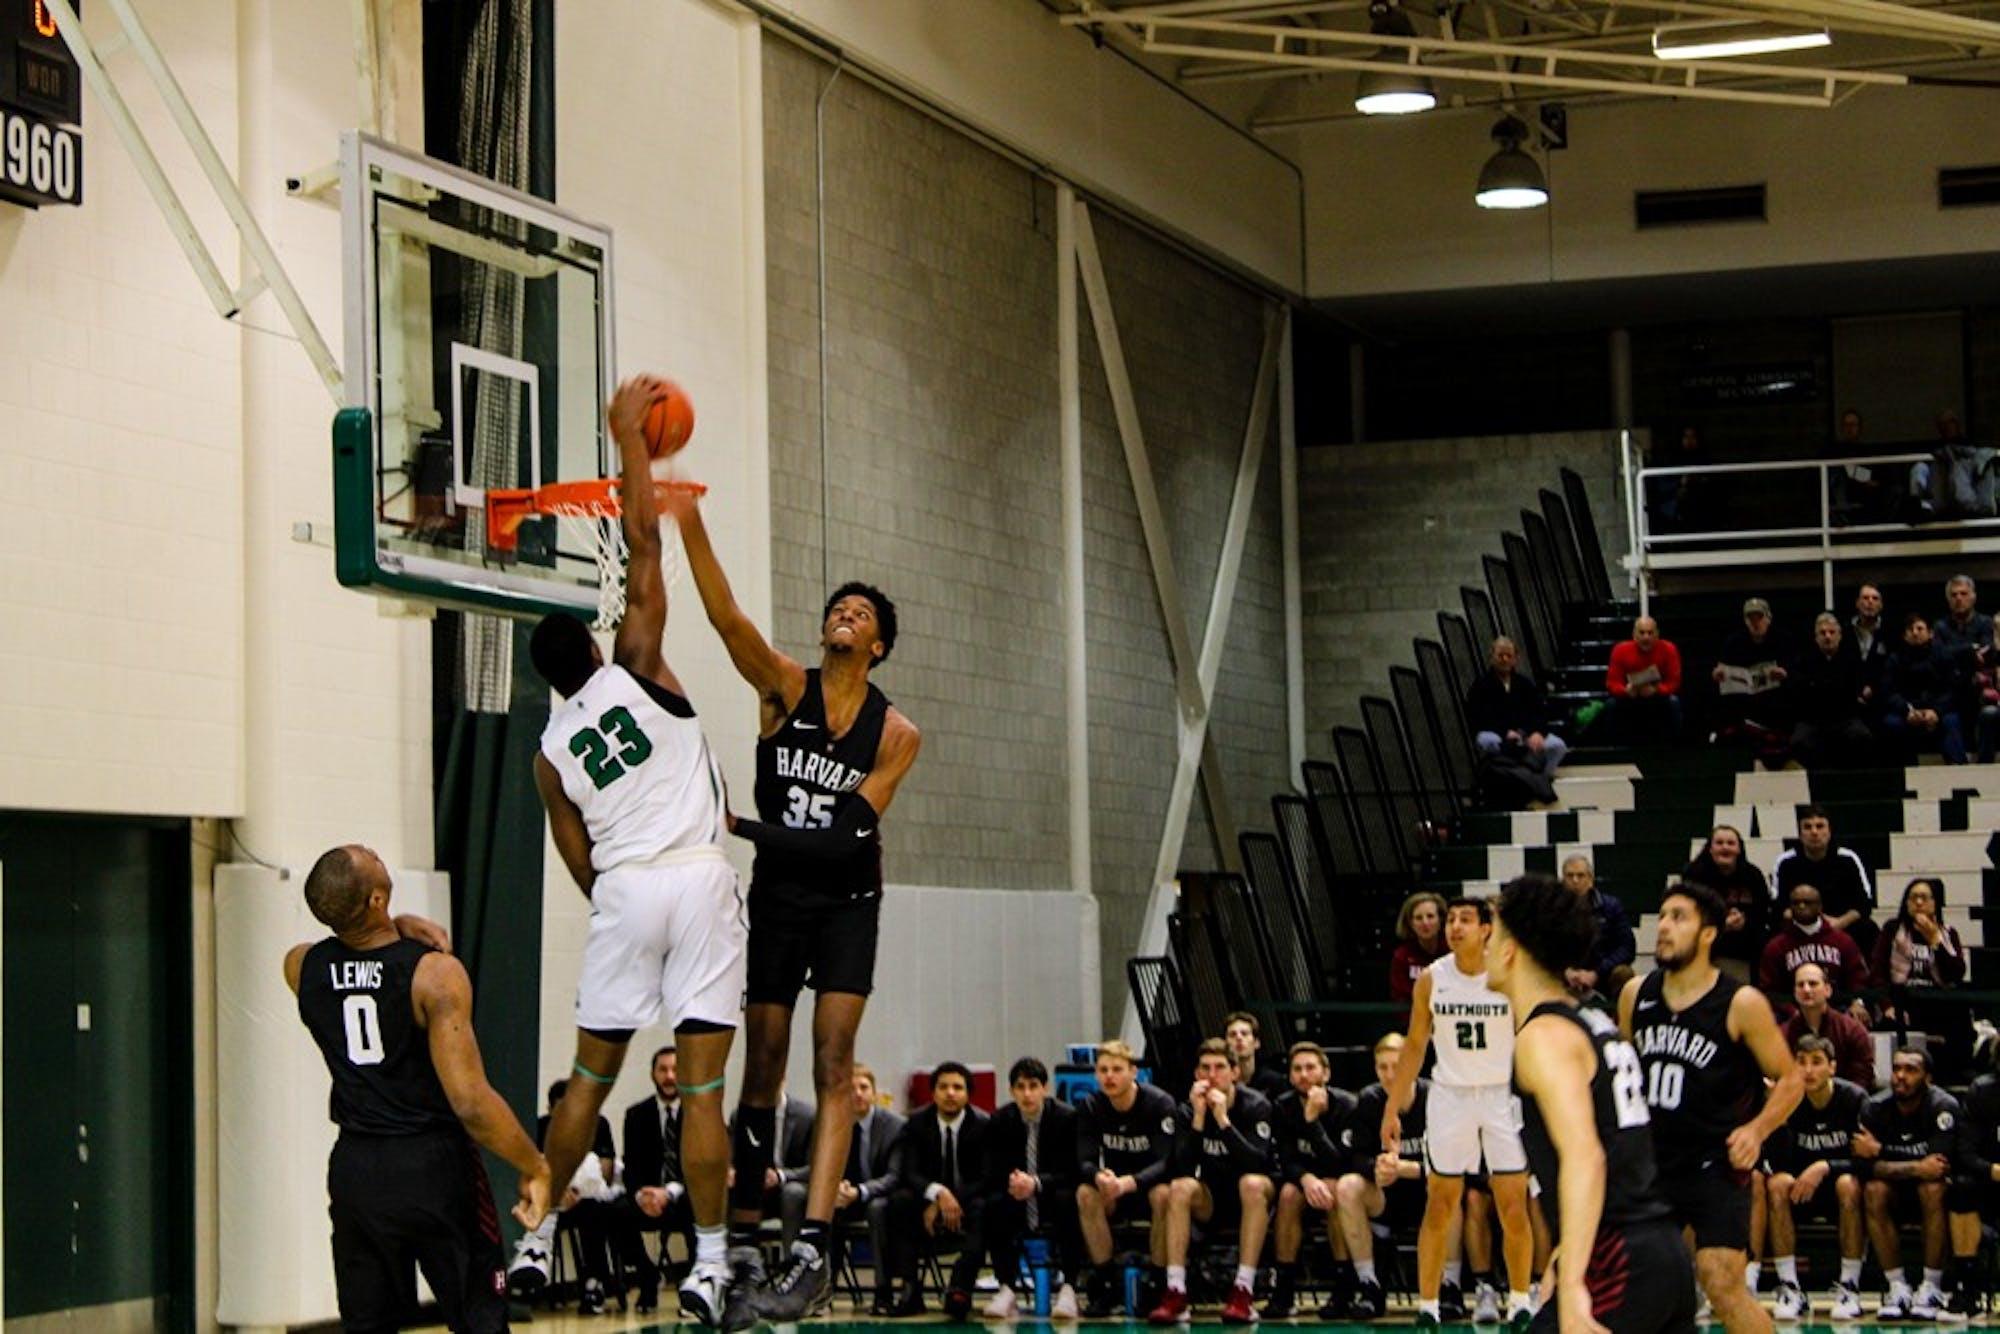 1-27-20-basketball1-lonagirardin